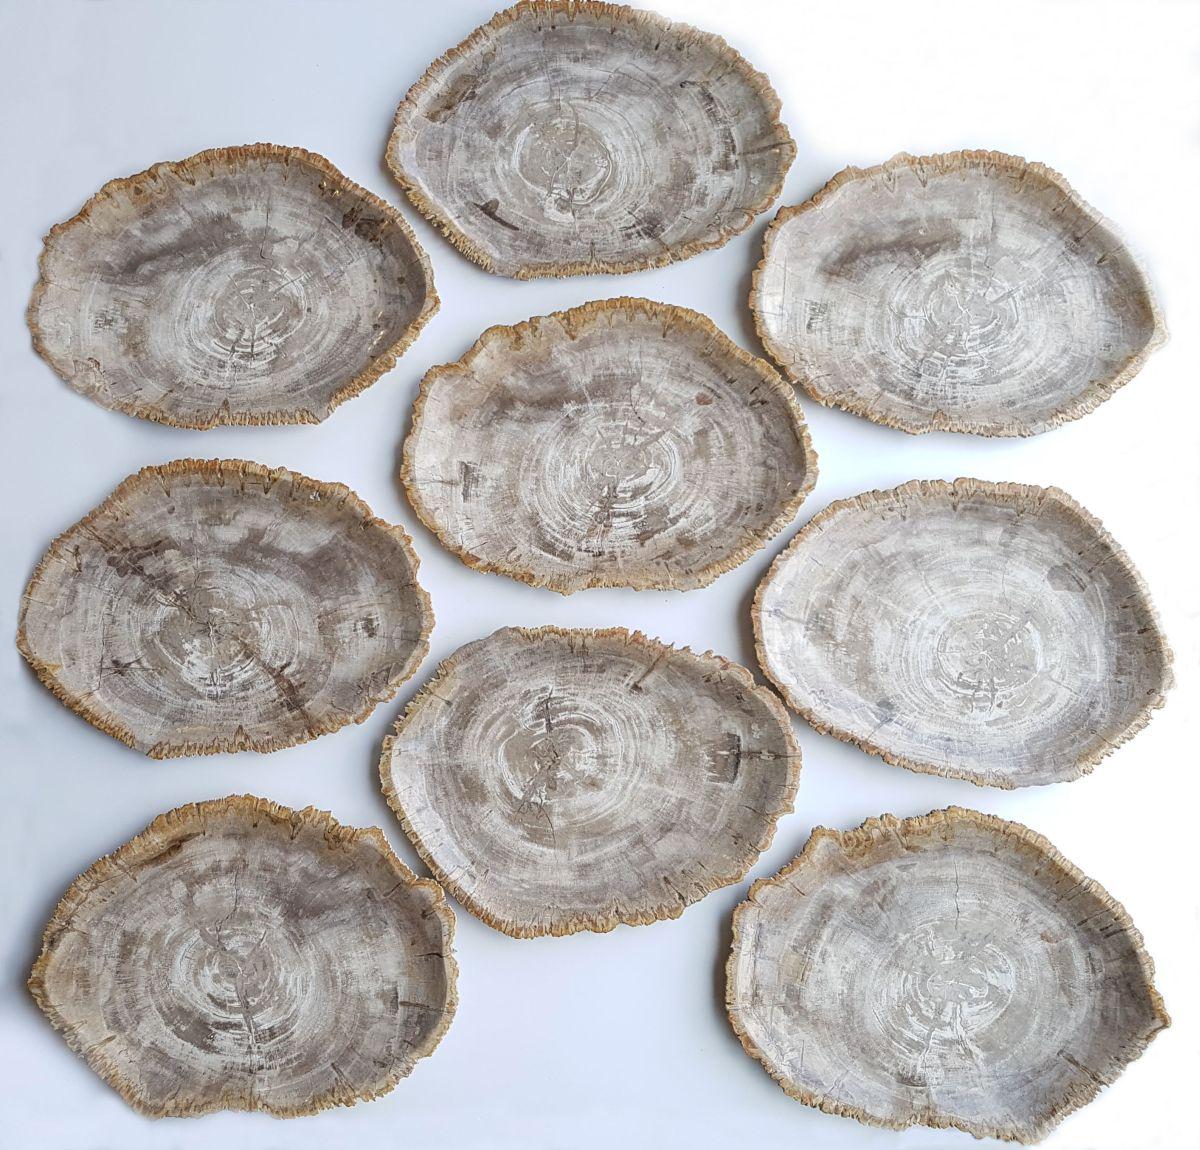 Plate petrified wood 33033b